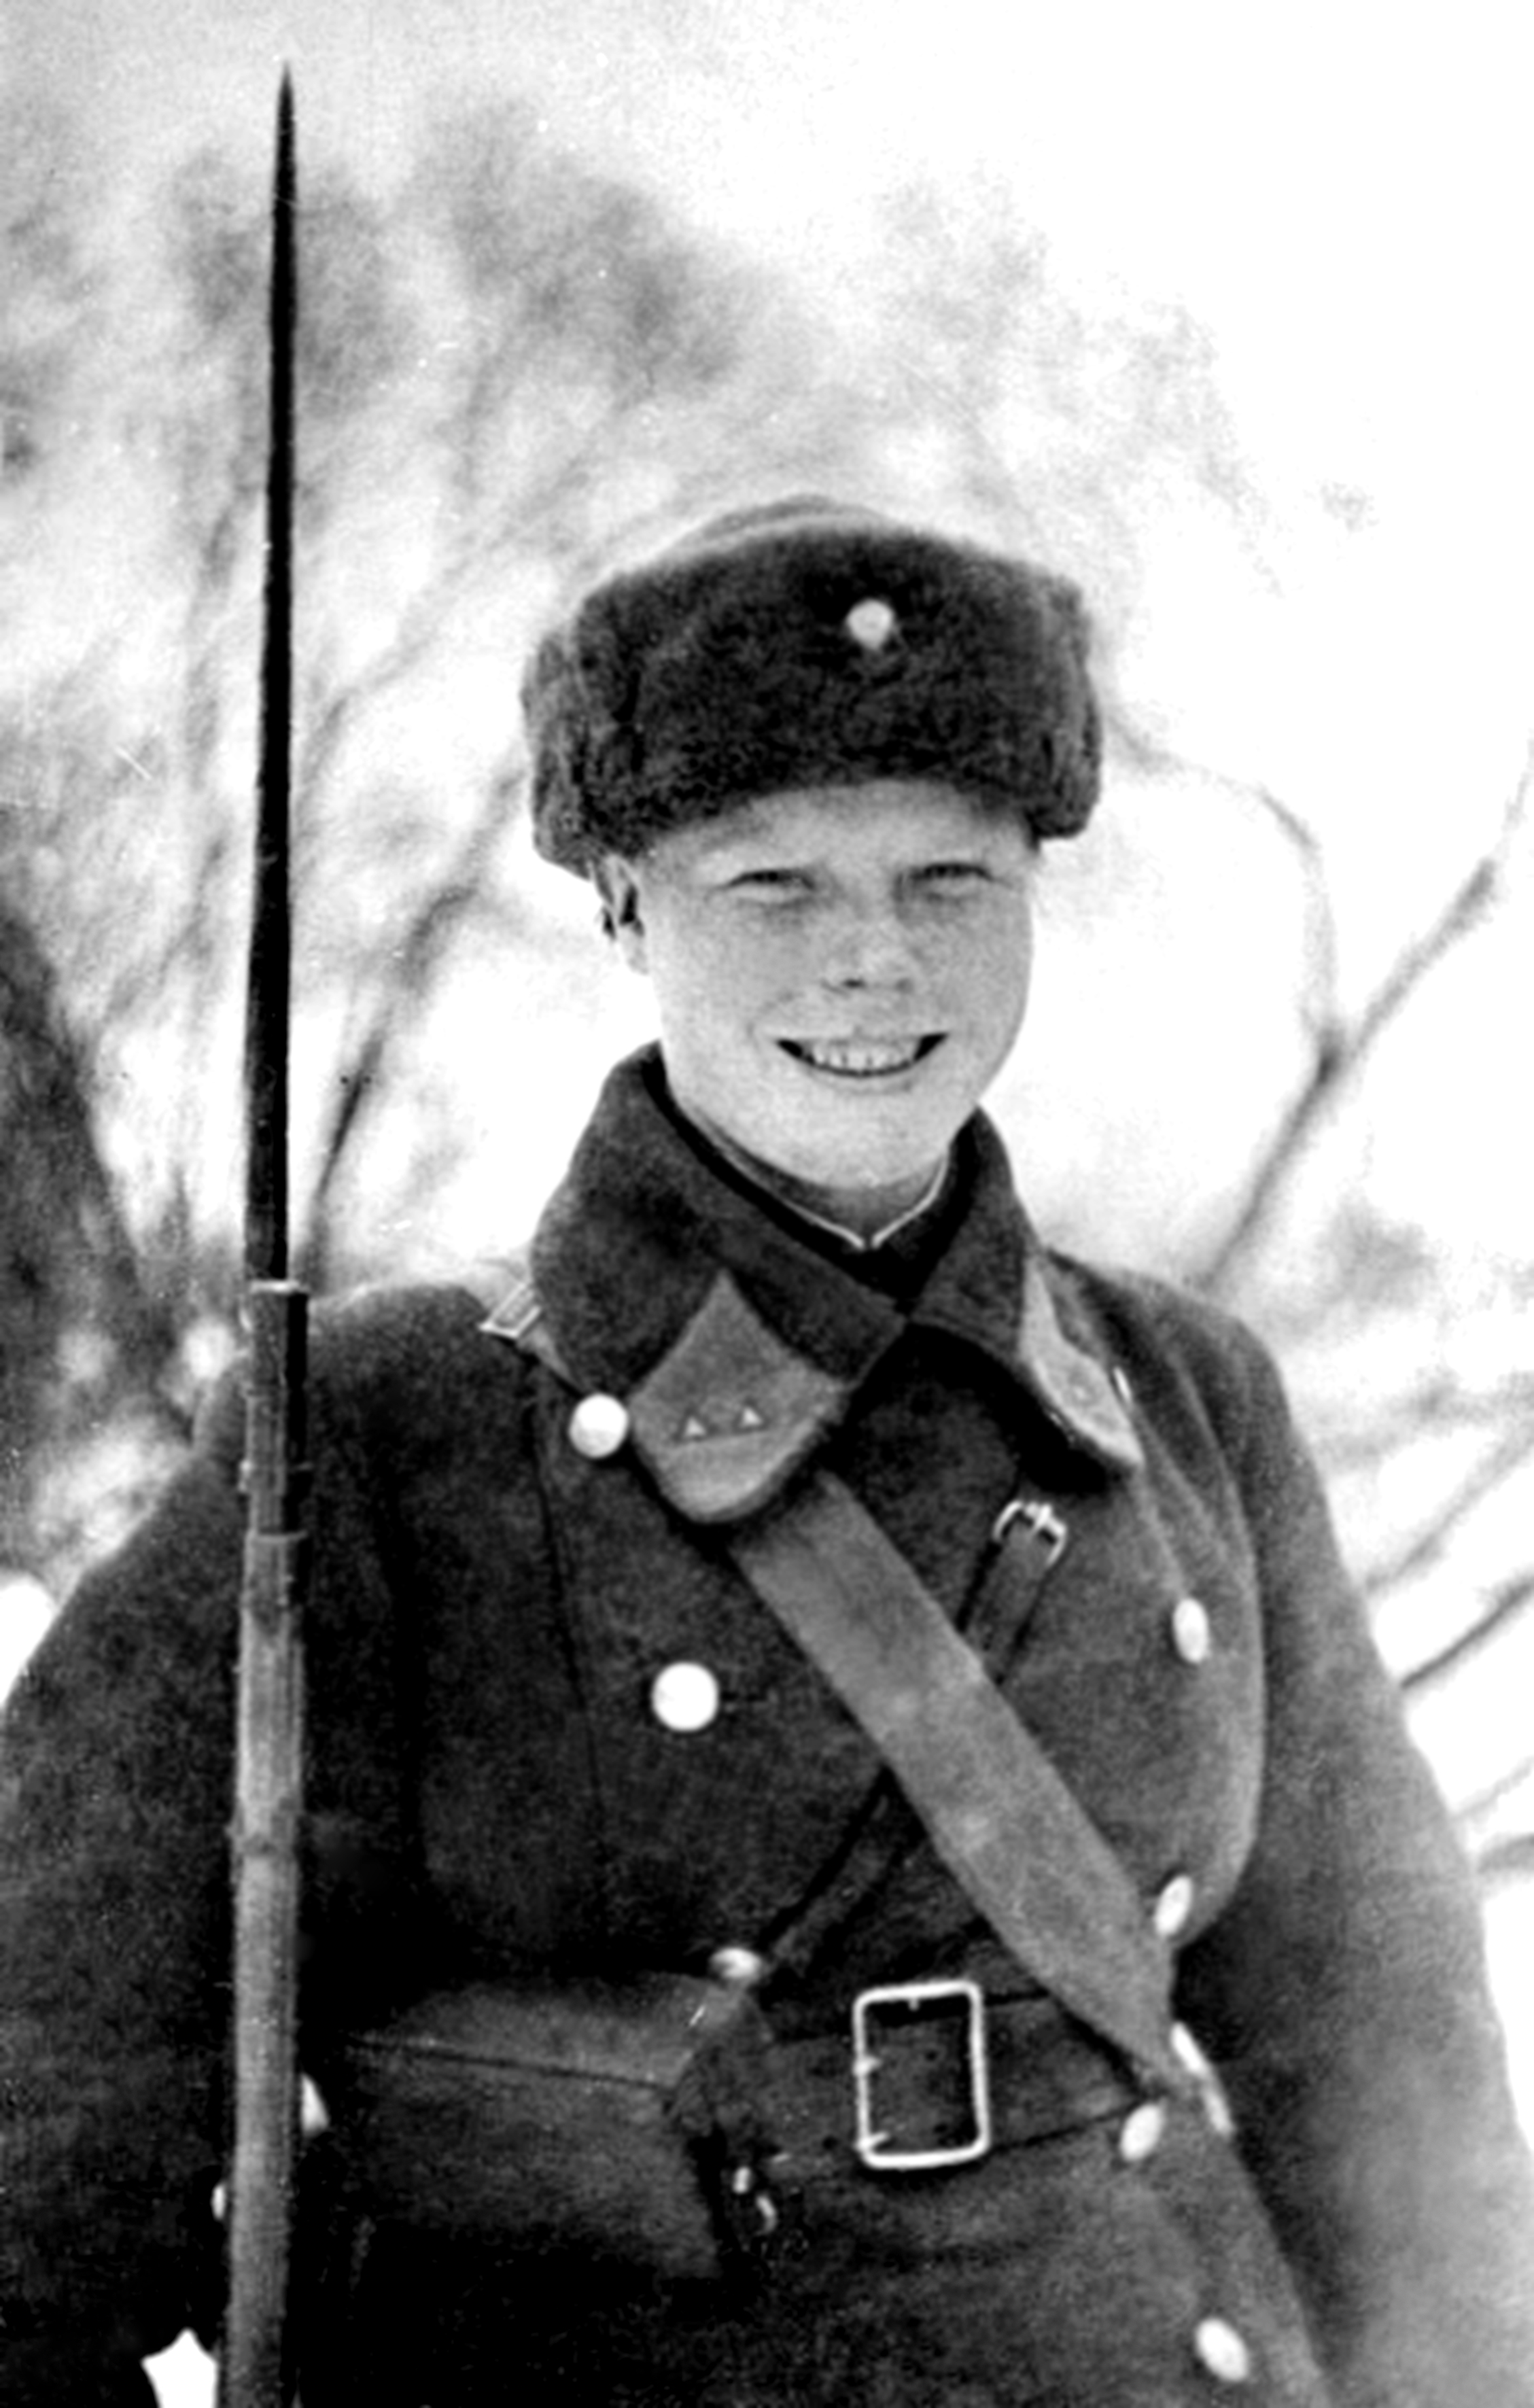 301041-l-d-ipatova-ia-starshijj-milicioner-komsomolka-zaderjhala-nemeckogo-shpiona-v-mome.jpg